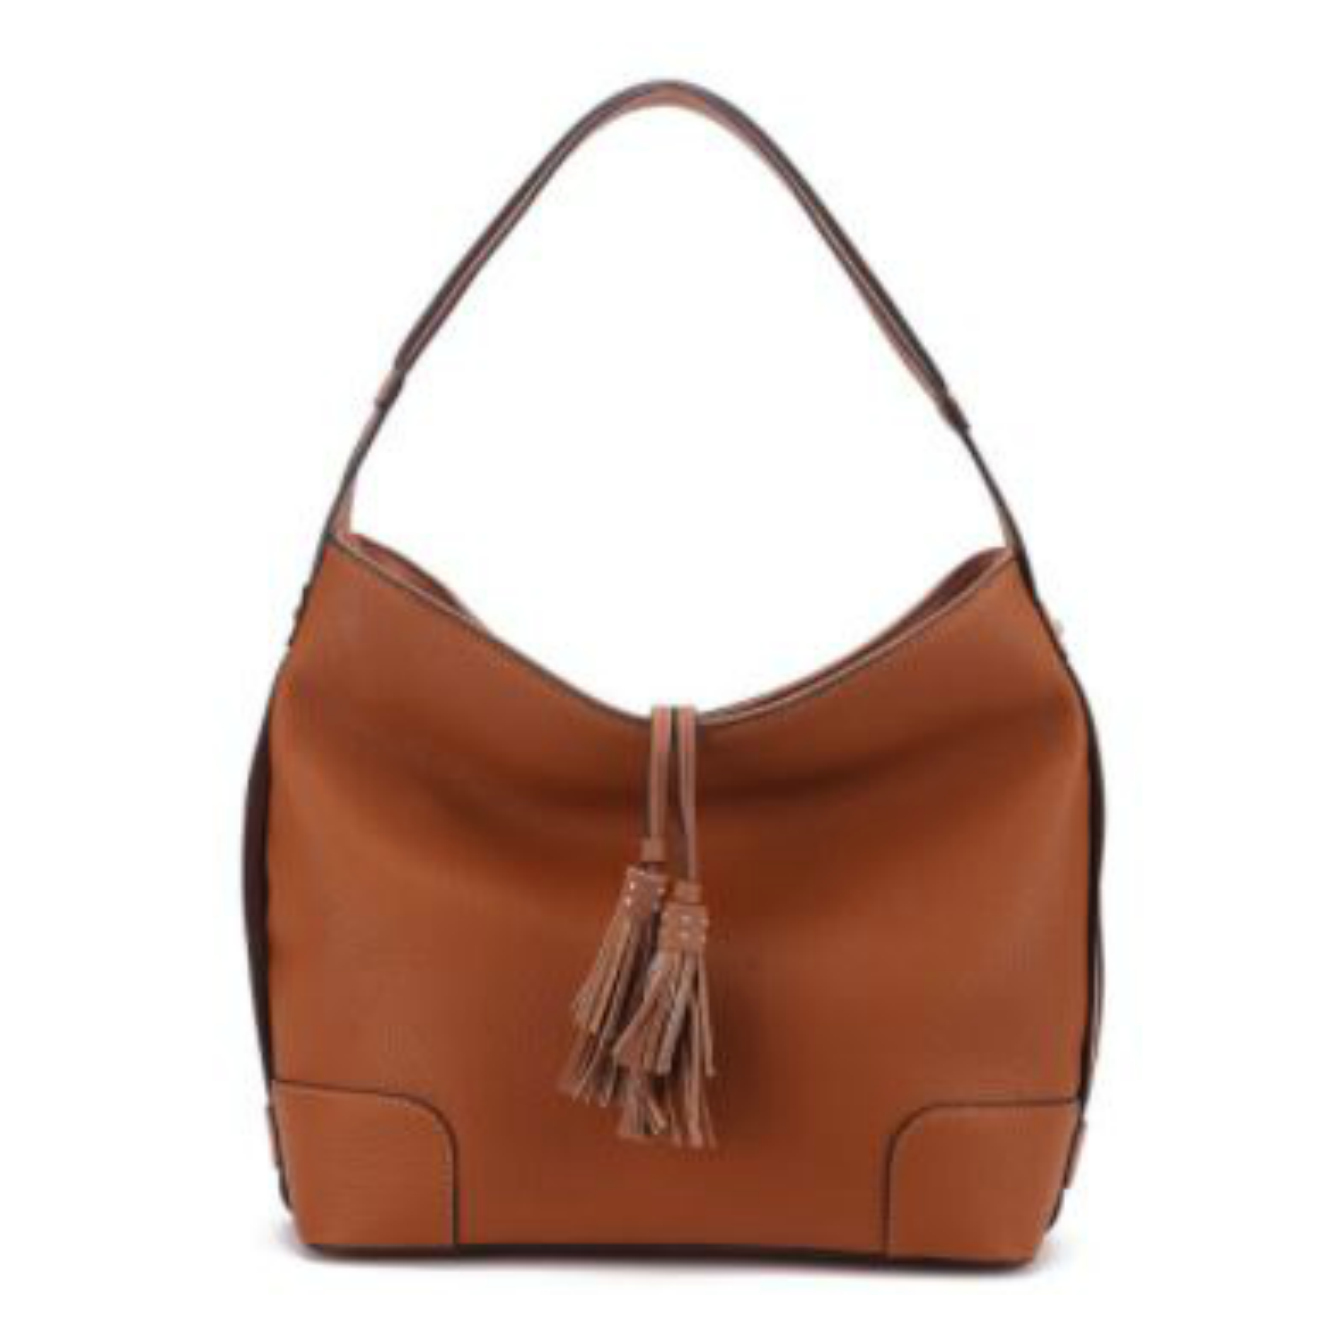 Top 5 Perfect Fall Handbags | 20% OFF Code! graphic